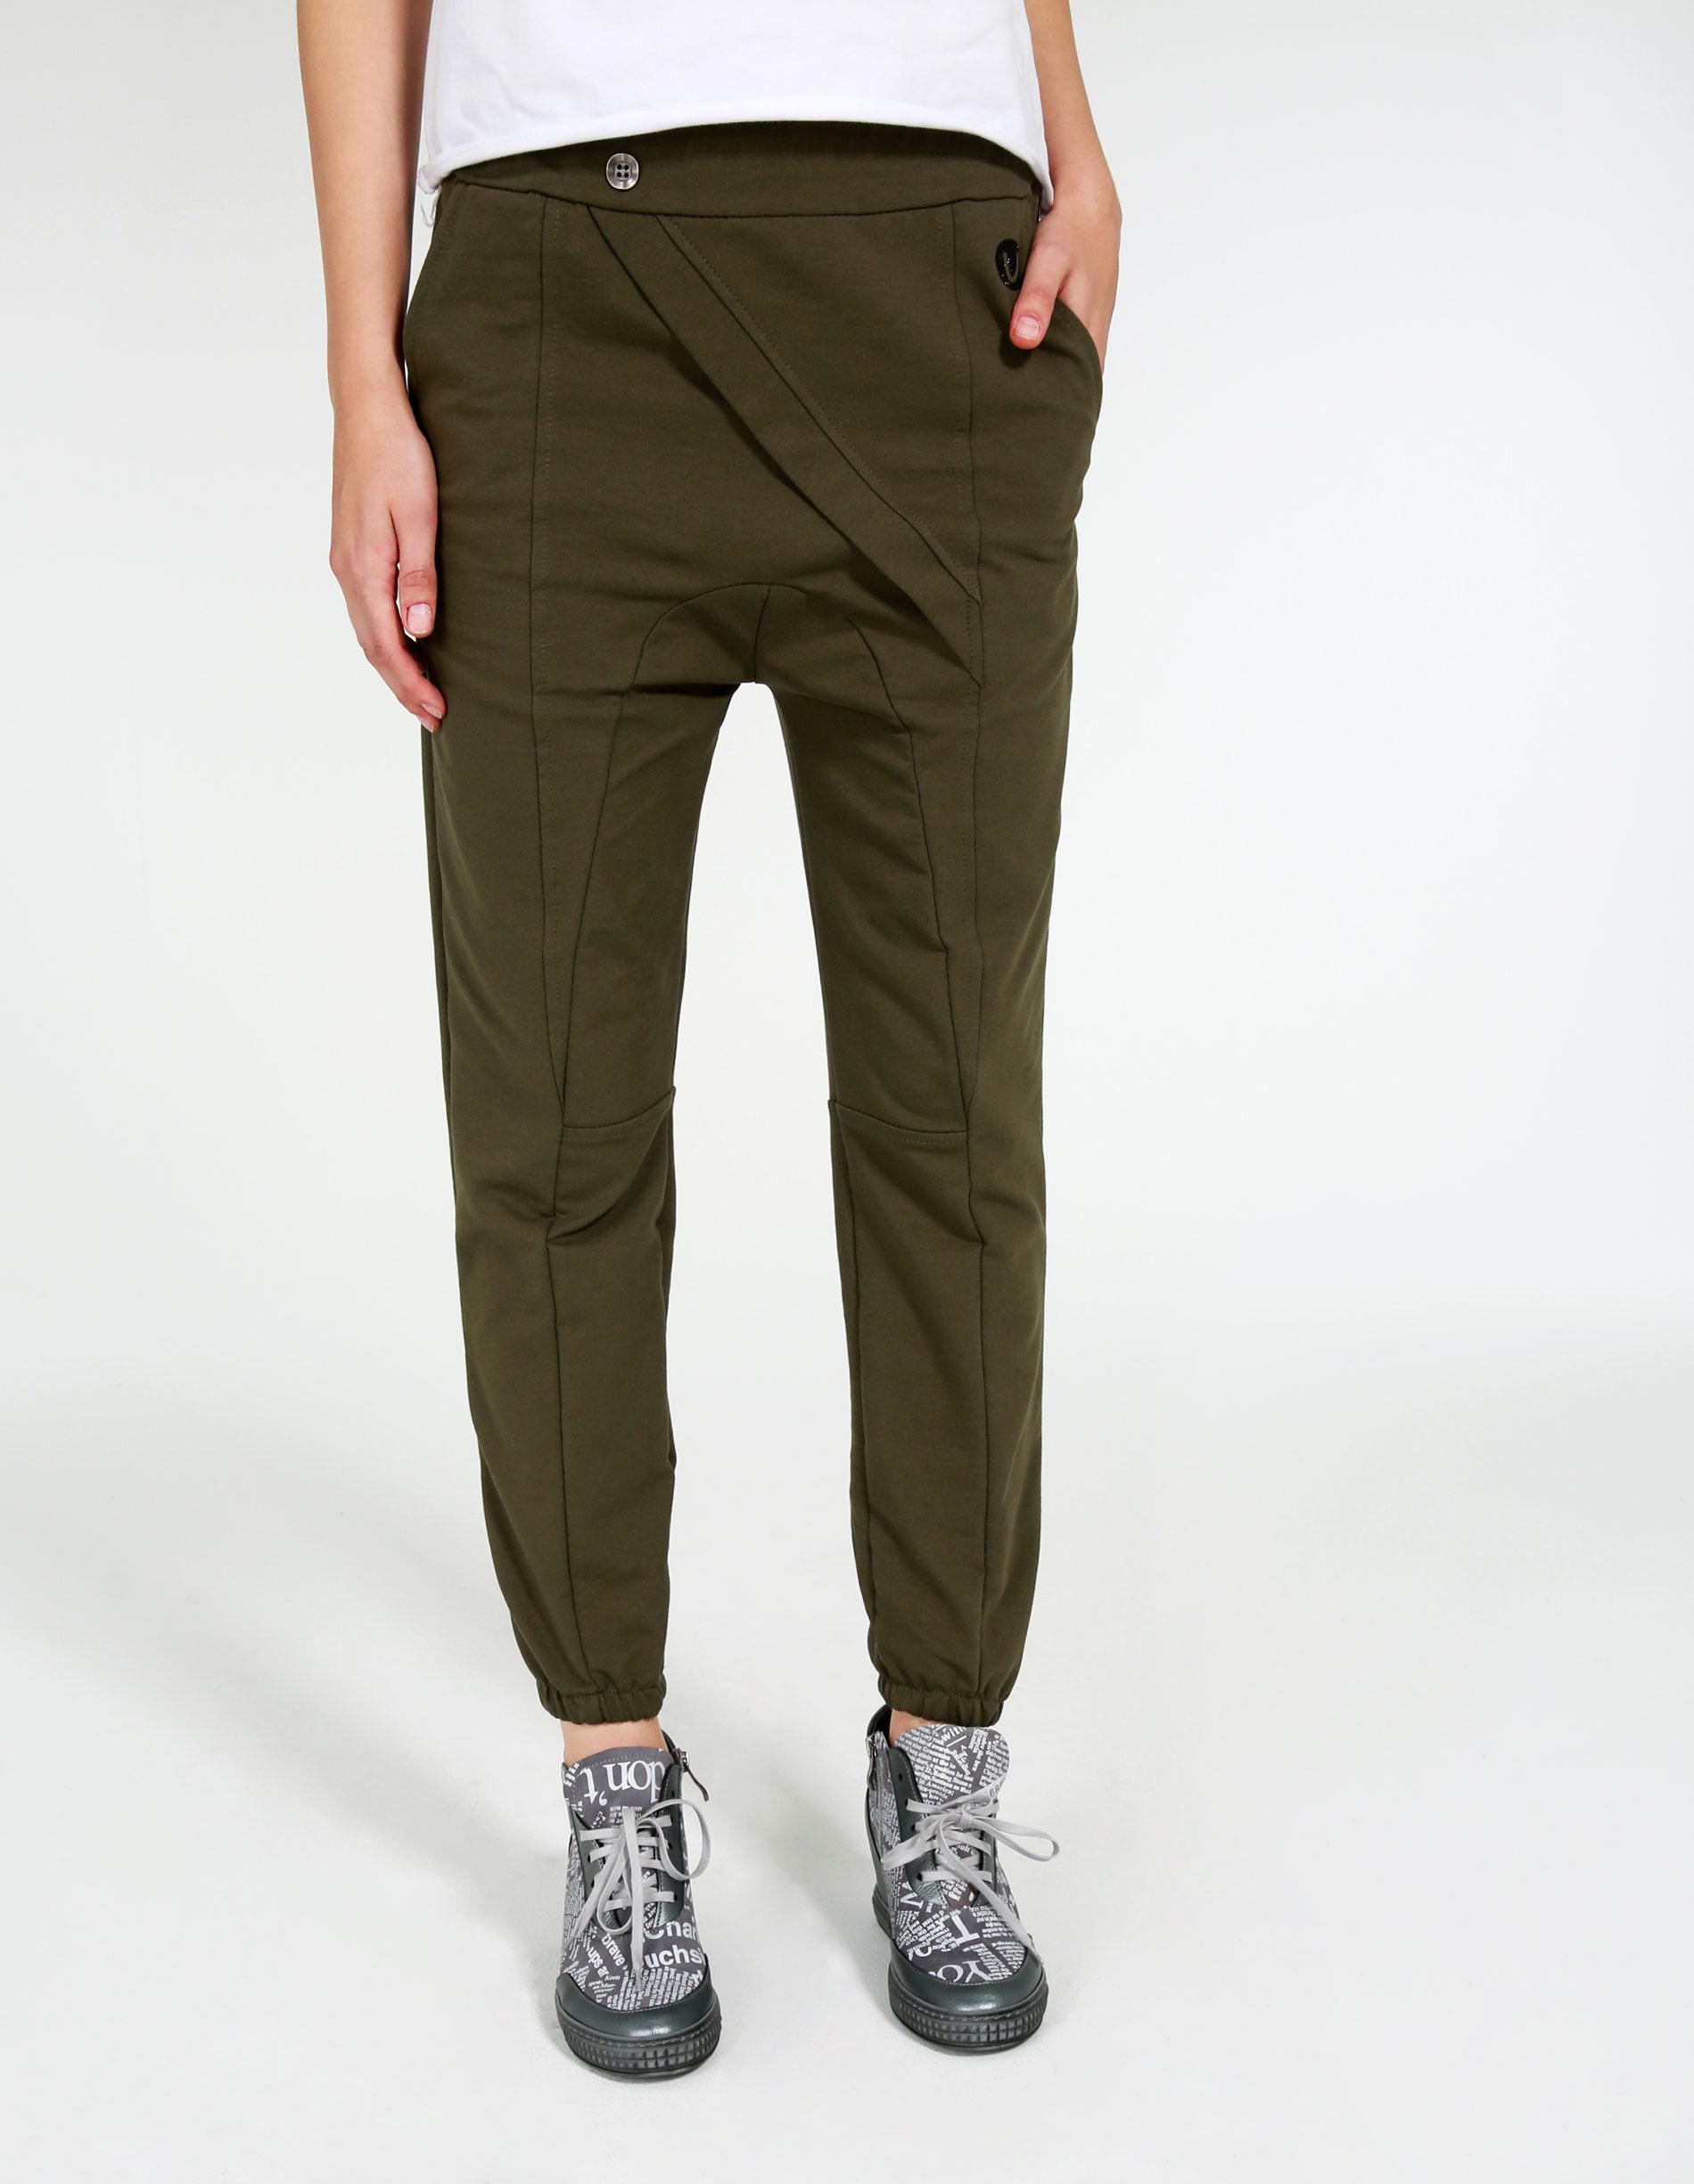 Spodnie - 30-67032 MILI - Unisono